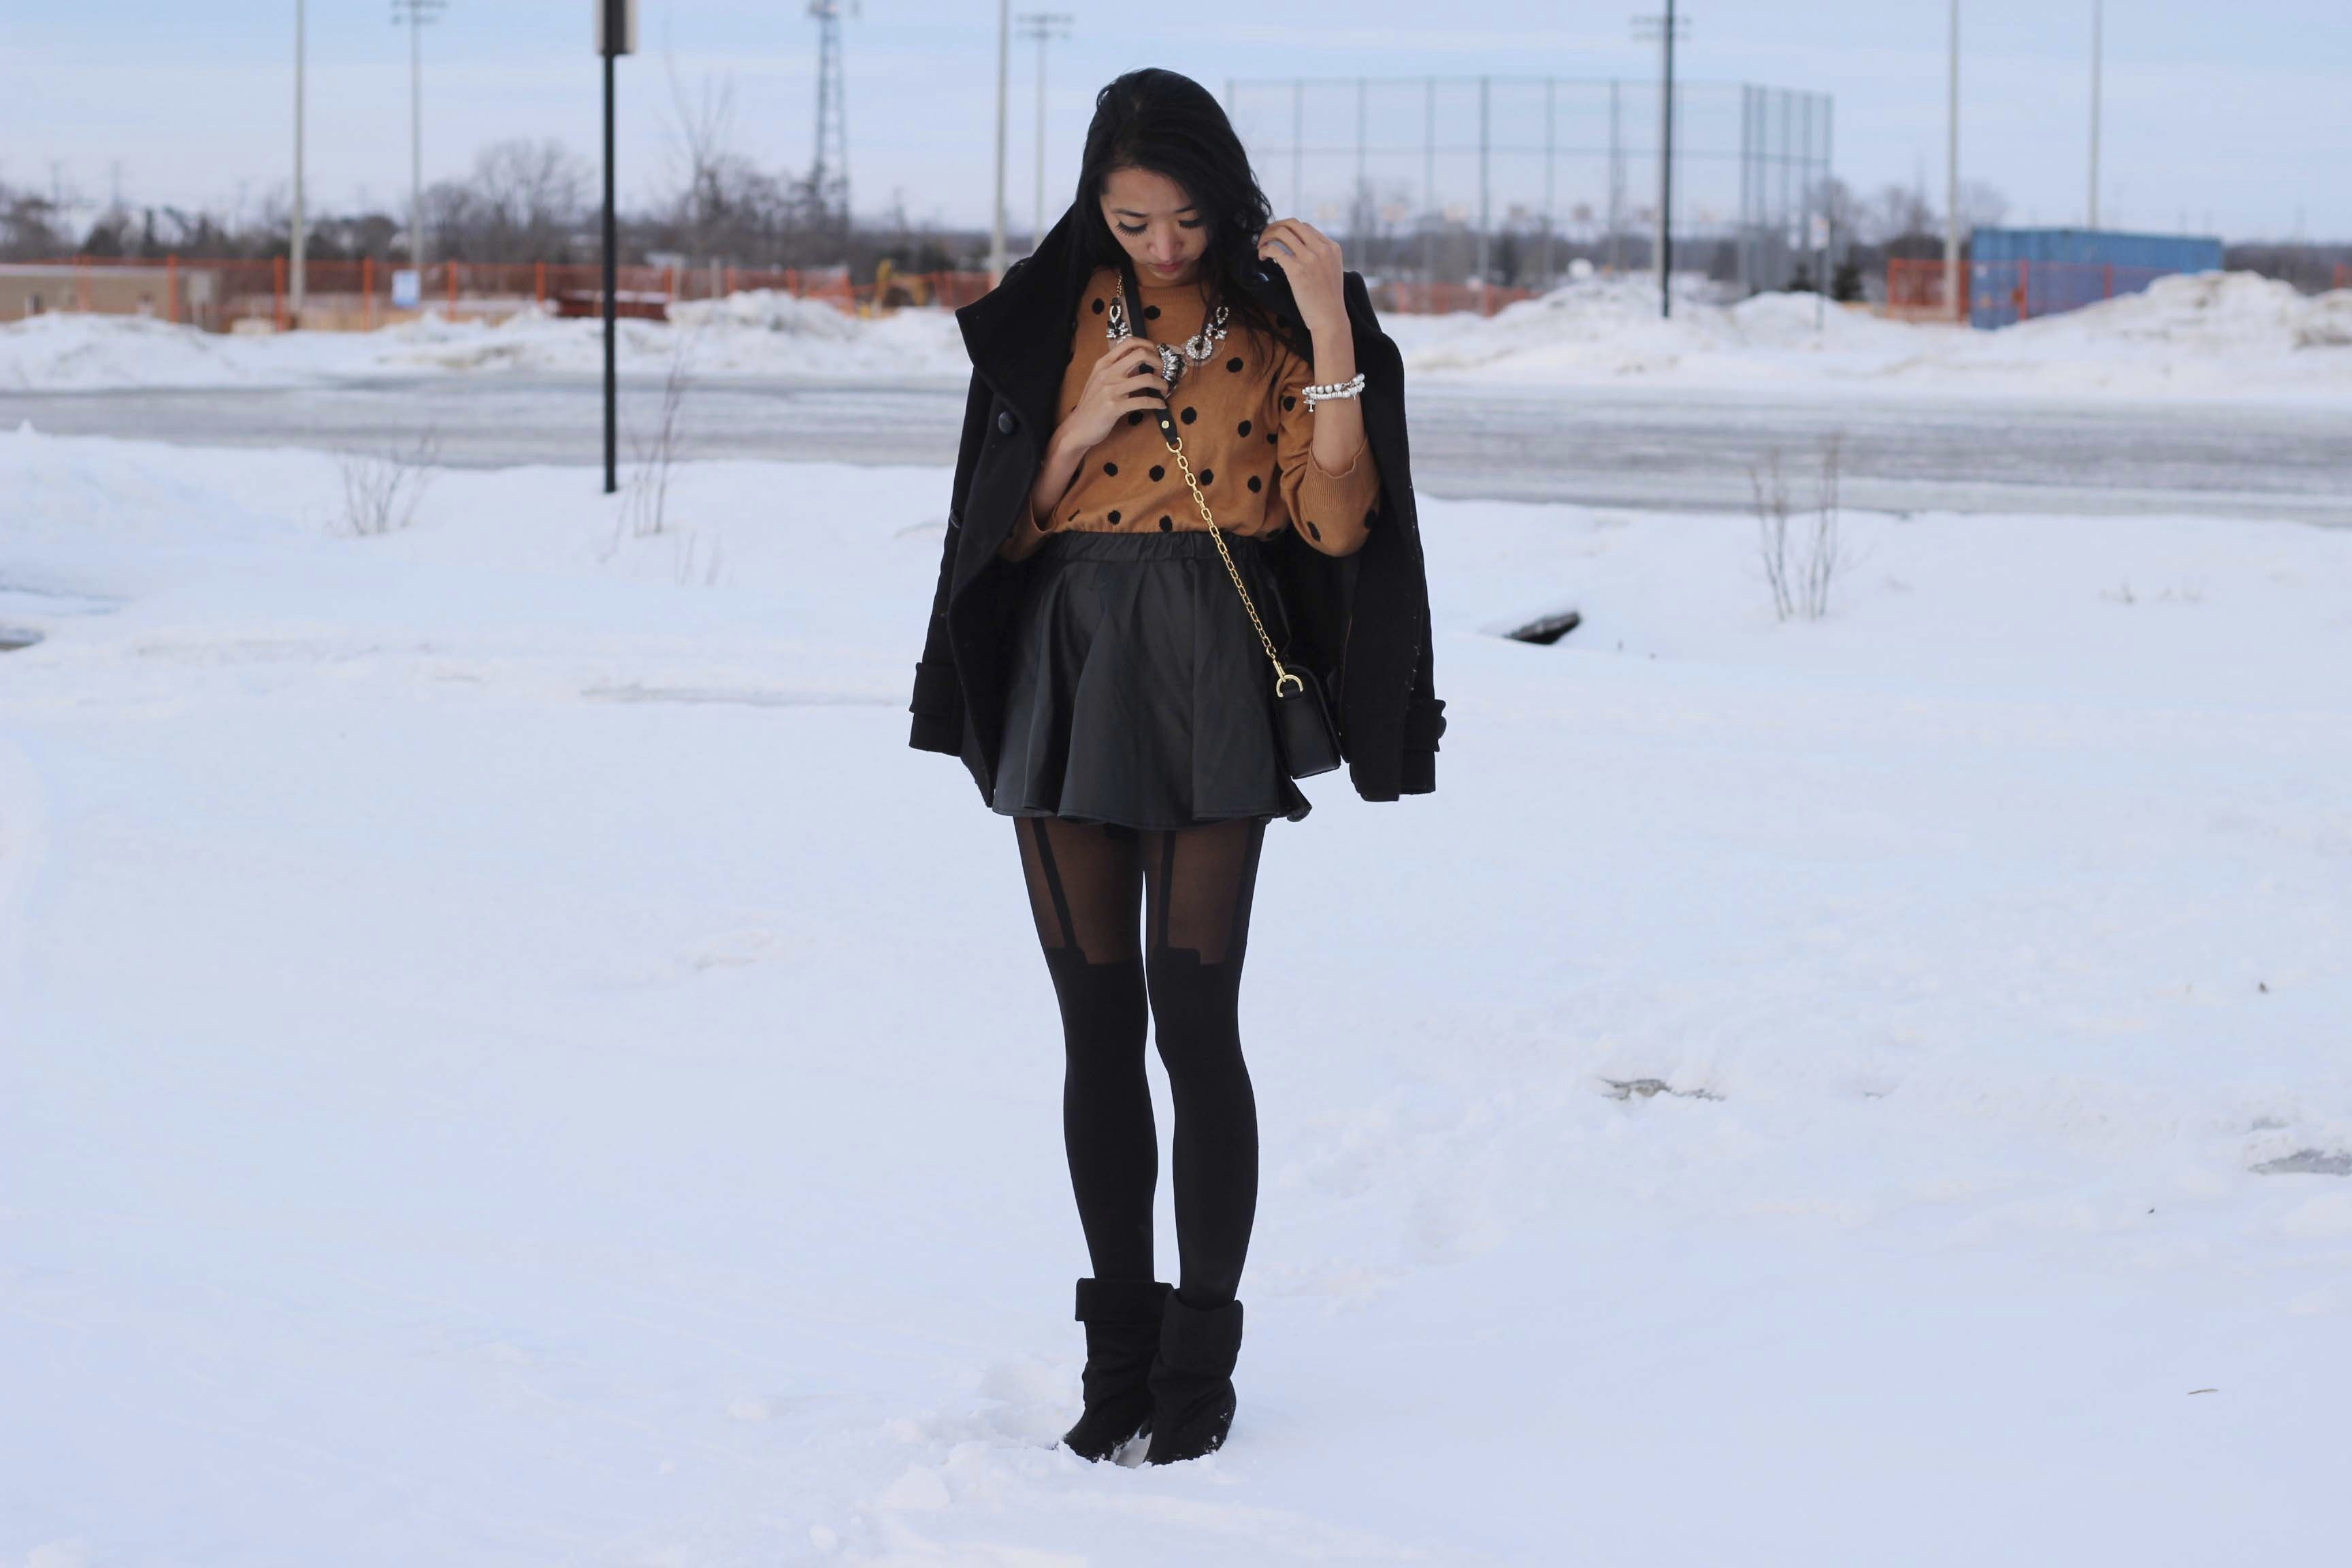 The Polkadot (By Jeannie Yeoh from http://www.leftinpink.blogspot.ca/) (http://www.whatiwear.com/look/detail/161923) #whatiwear #fashion #blogger #pattern #polkadot #wow #wiw #ootd